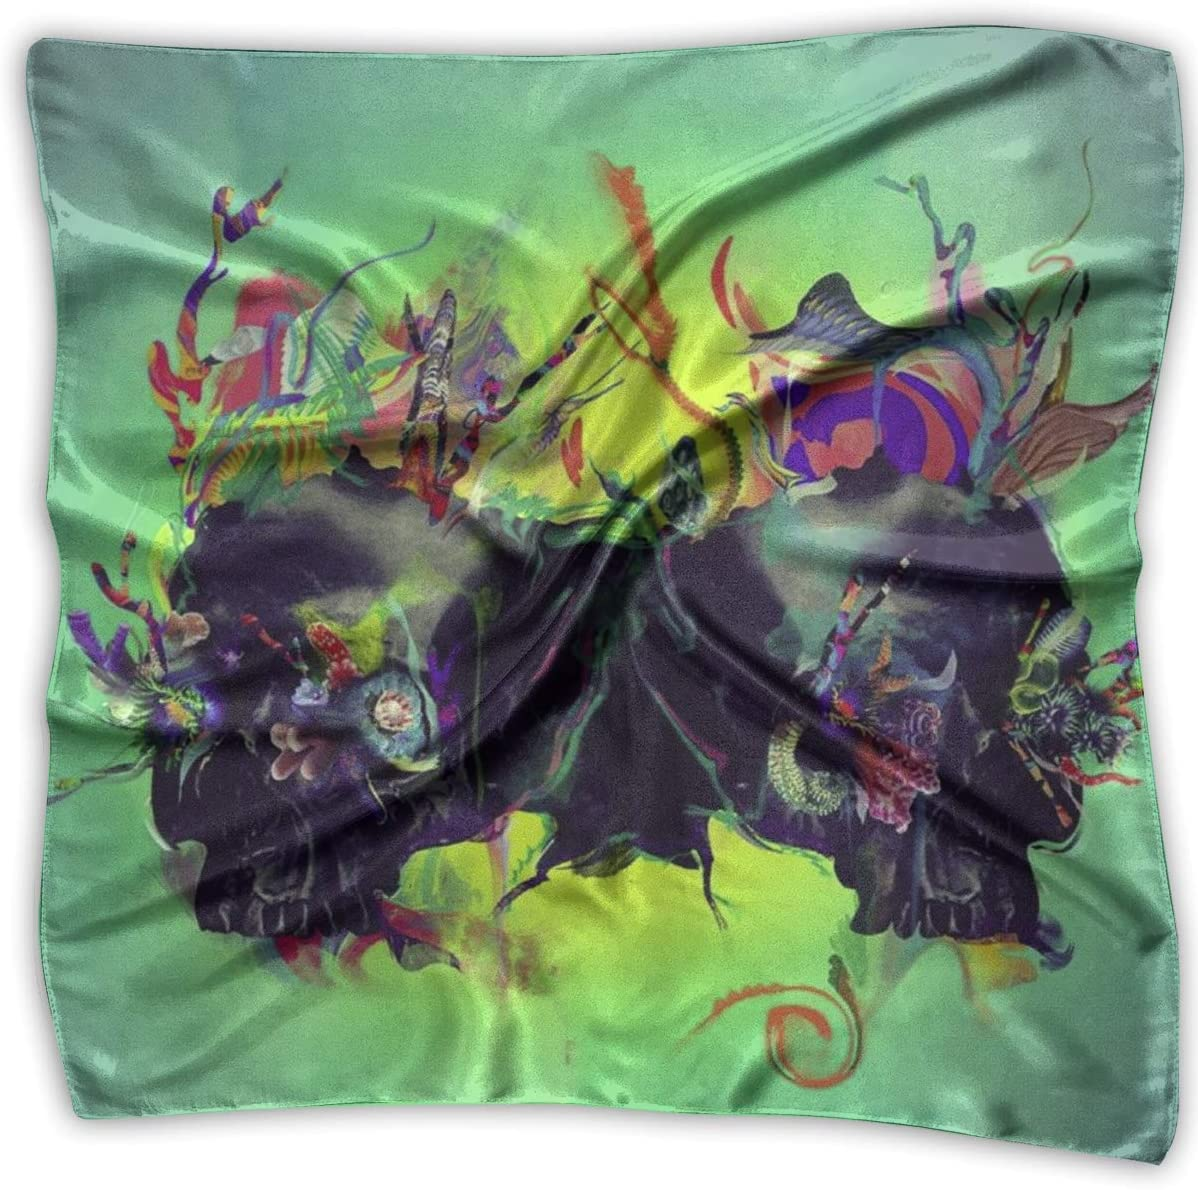 Bandana de seda, pañuelo de calavera de la muerte, hermosas diademas cuadradas para montar a caballo, senderismo, 100X100 CM